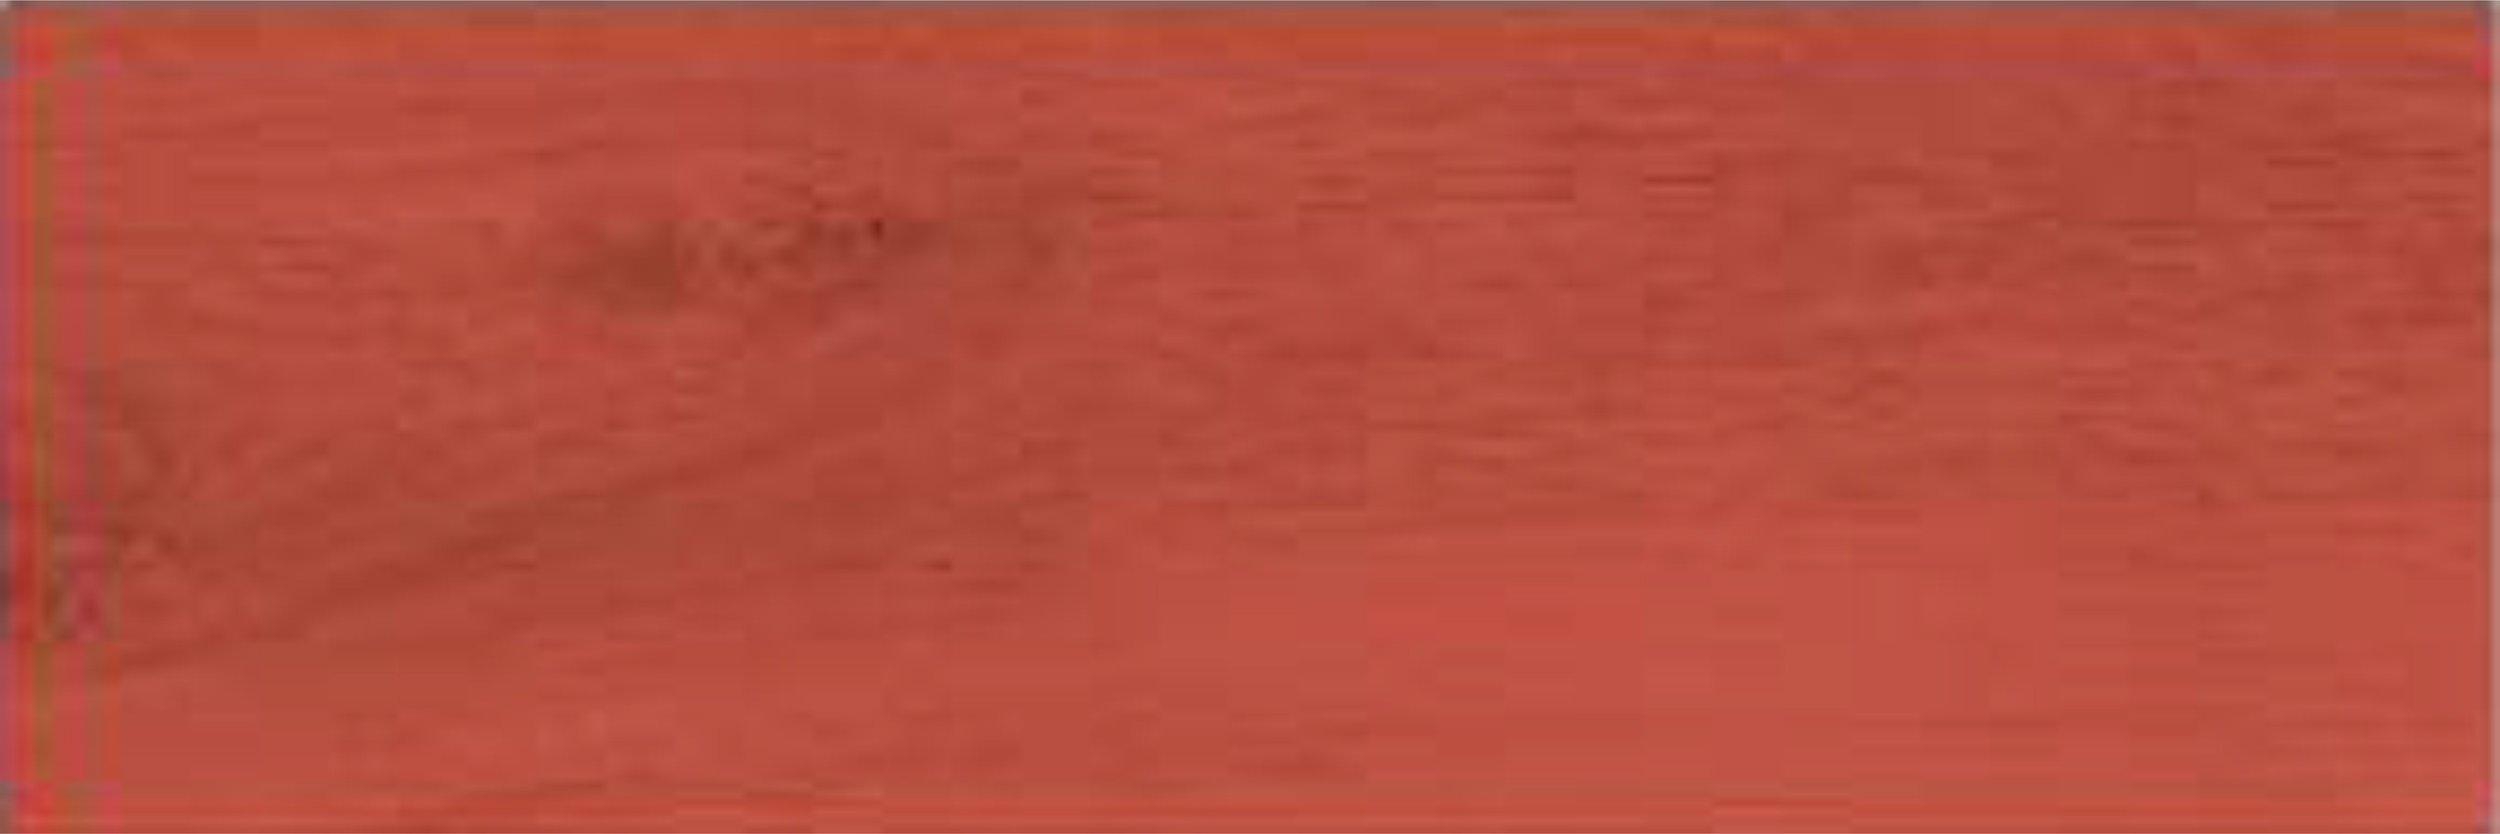 Vermis Rojo 20x60 cm